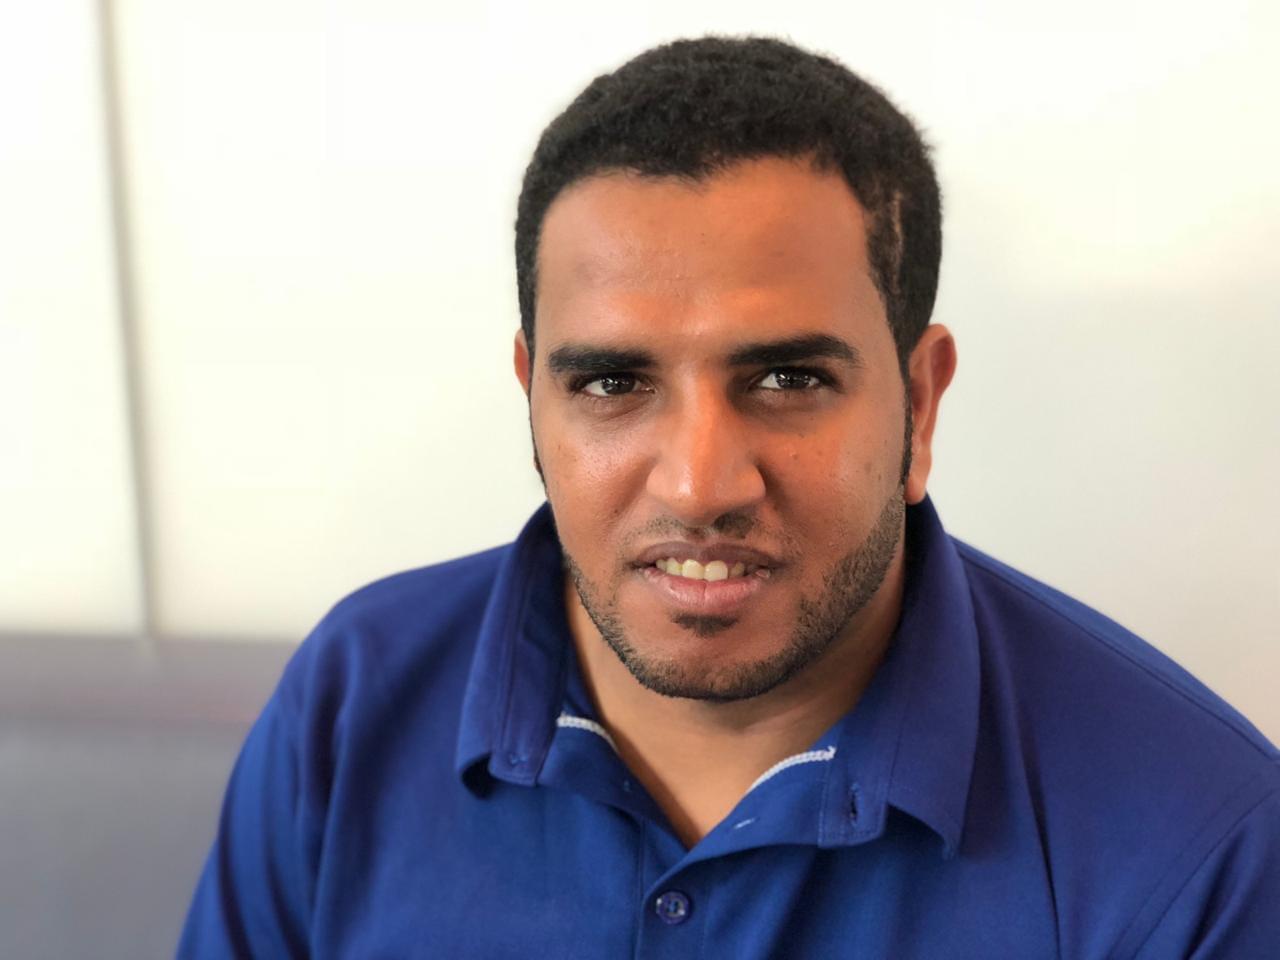 ABDULLAH AL SABAHI